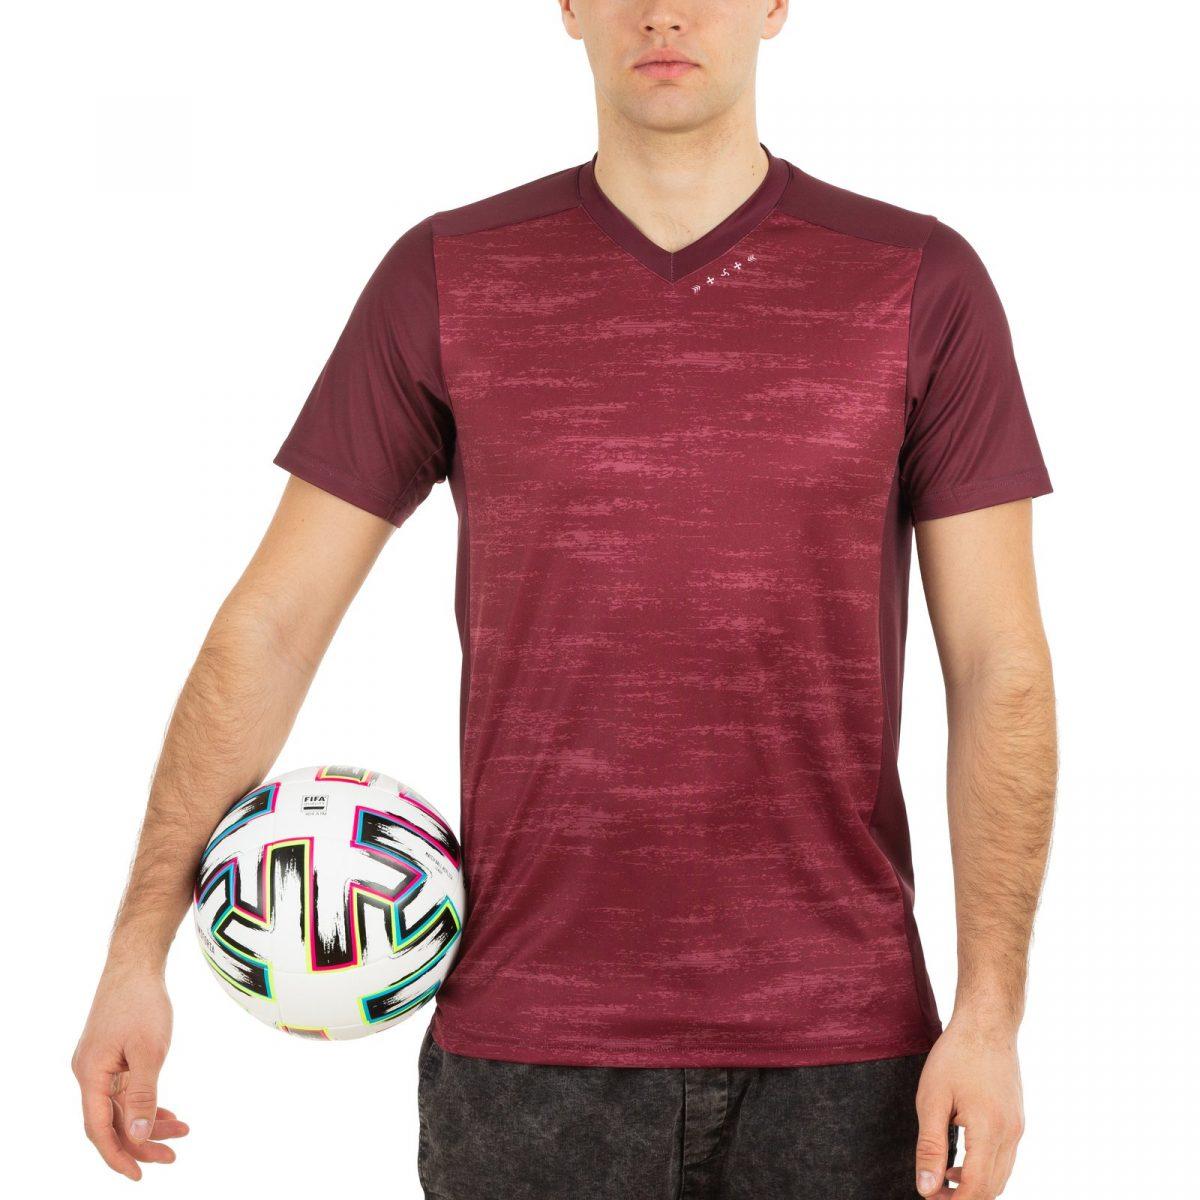 Futbola fanu krekls ar apdruku